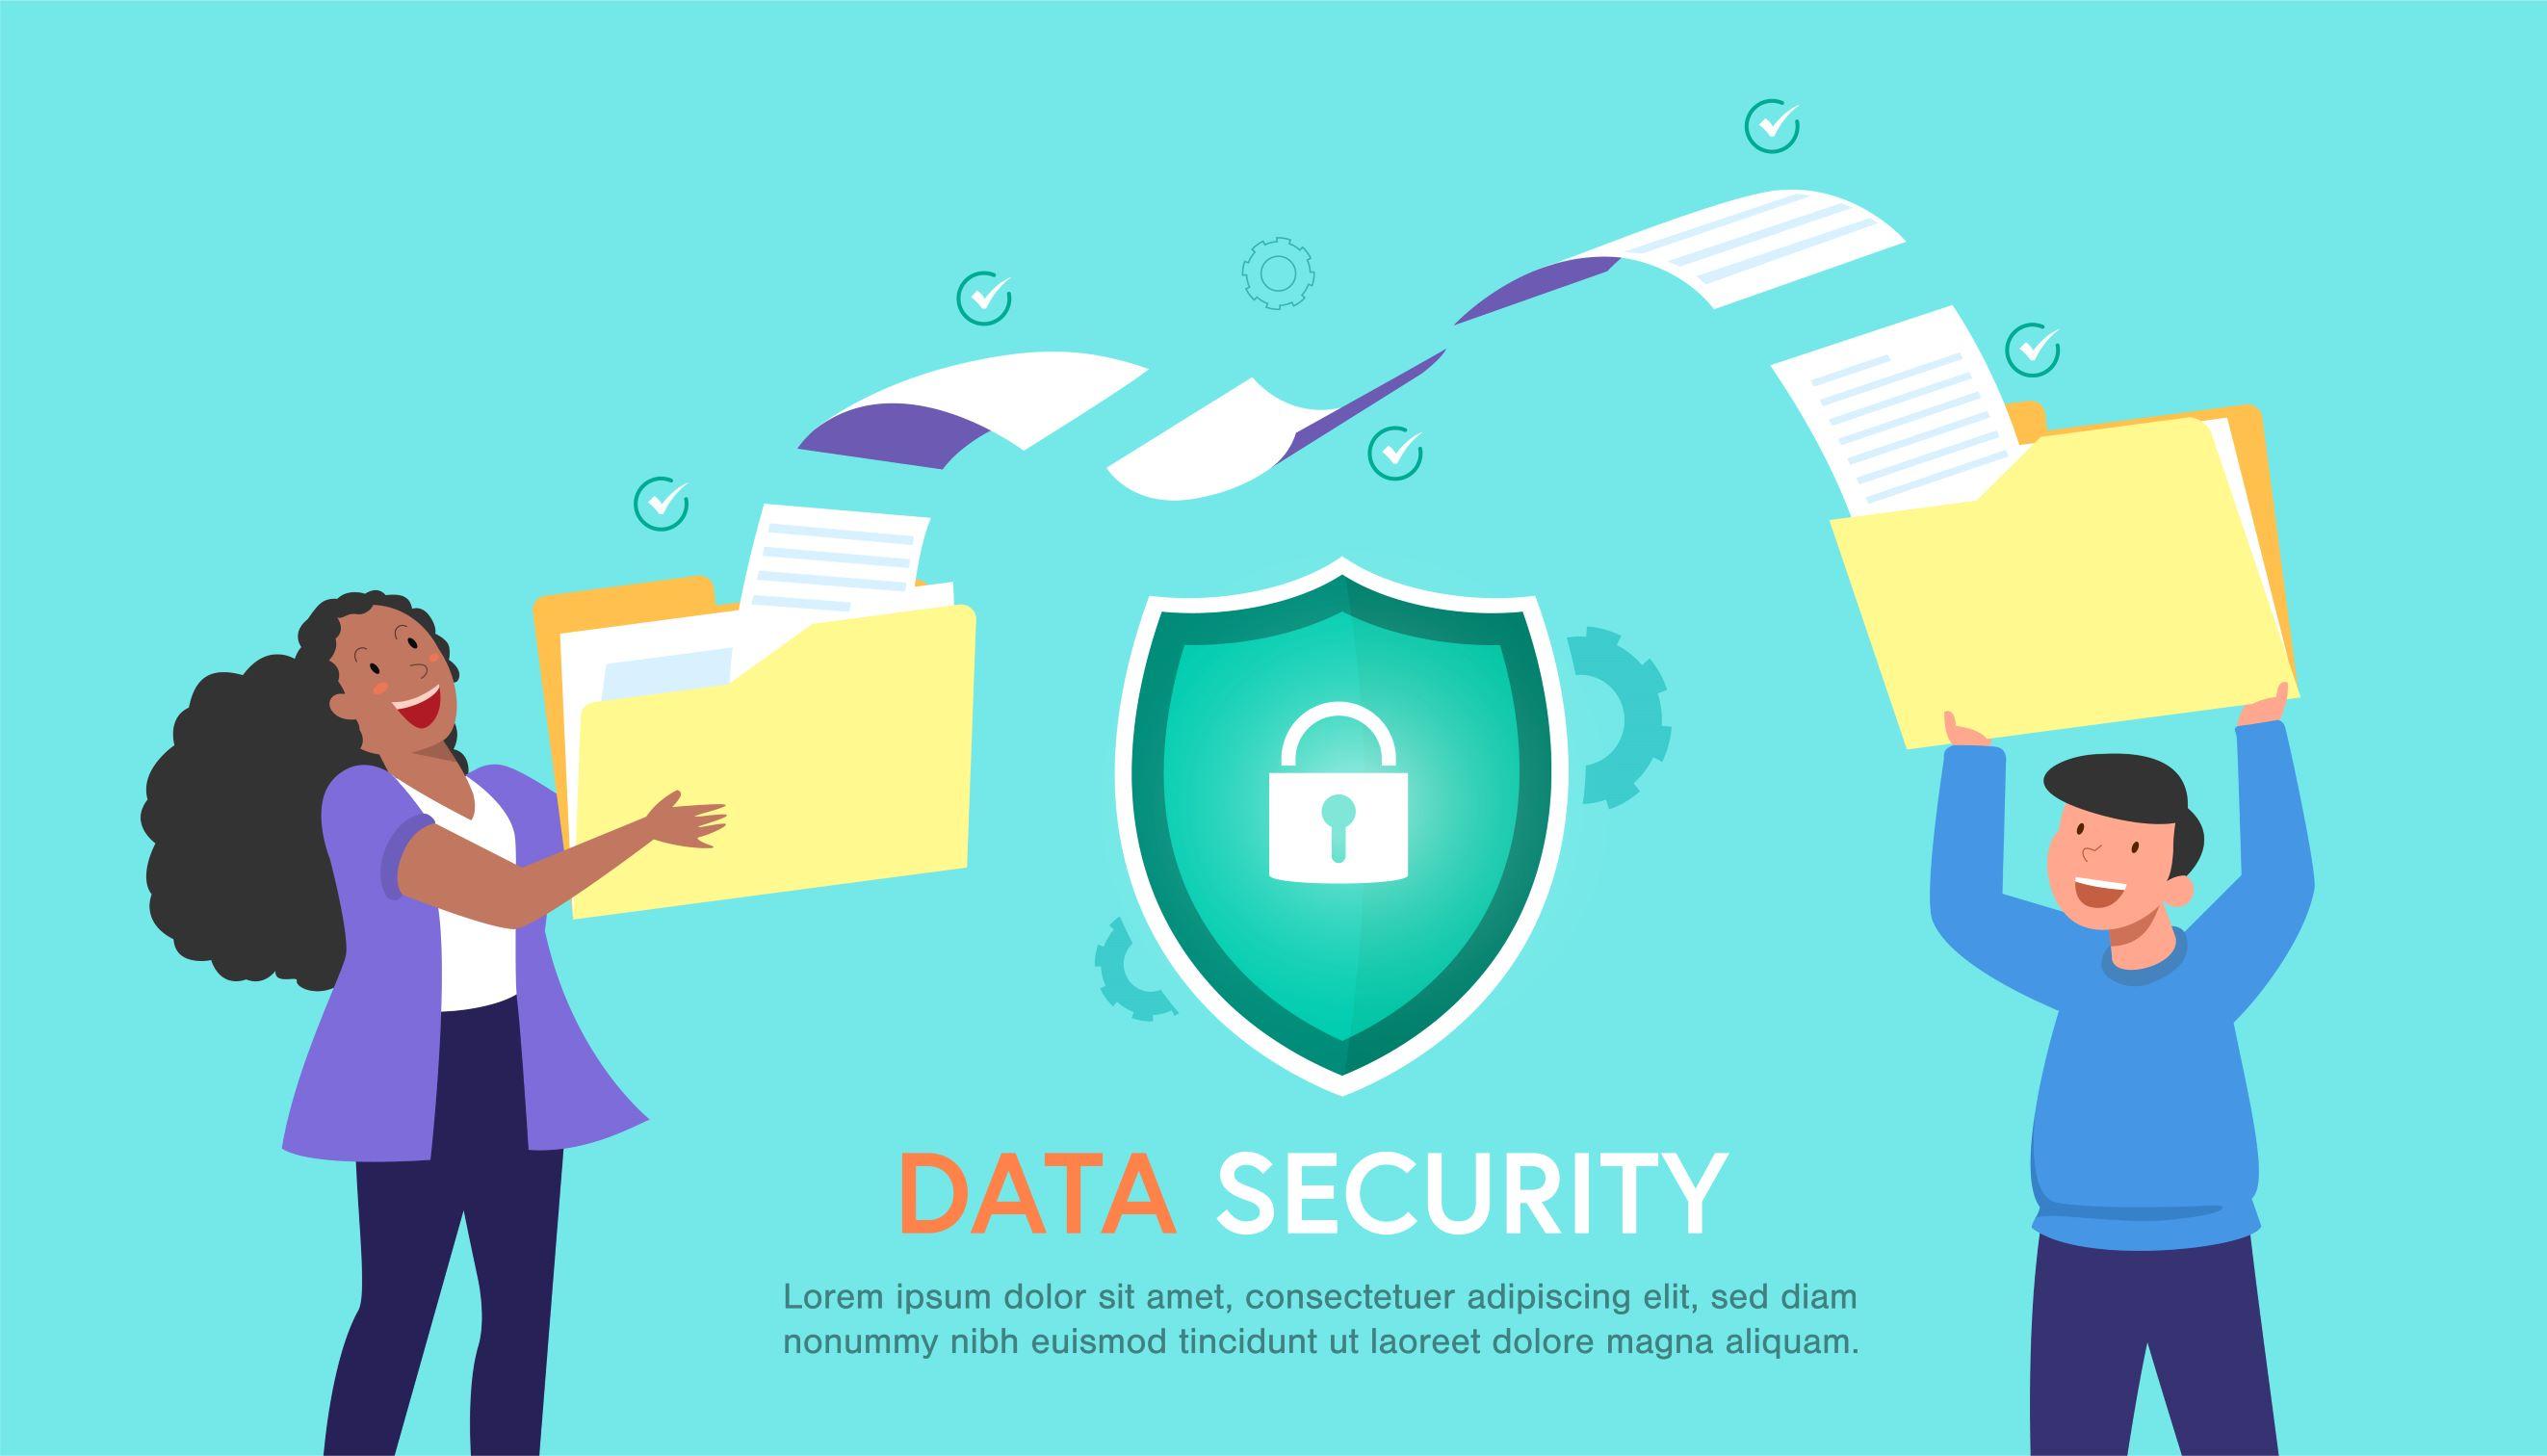 database-design-audit-log-tracking-changes-to-column-data-value-changes-part-1-data-security